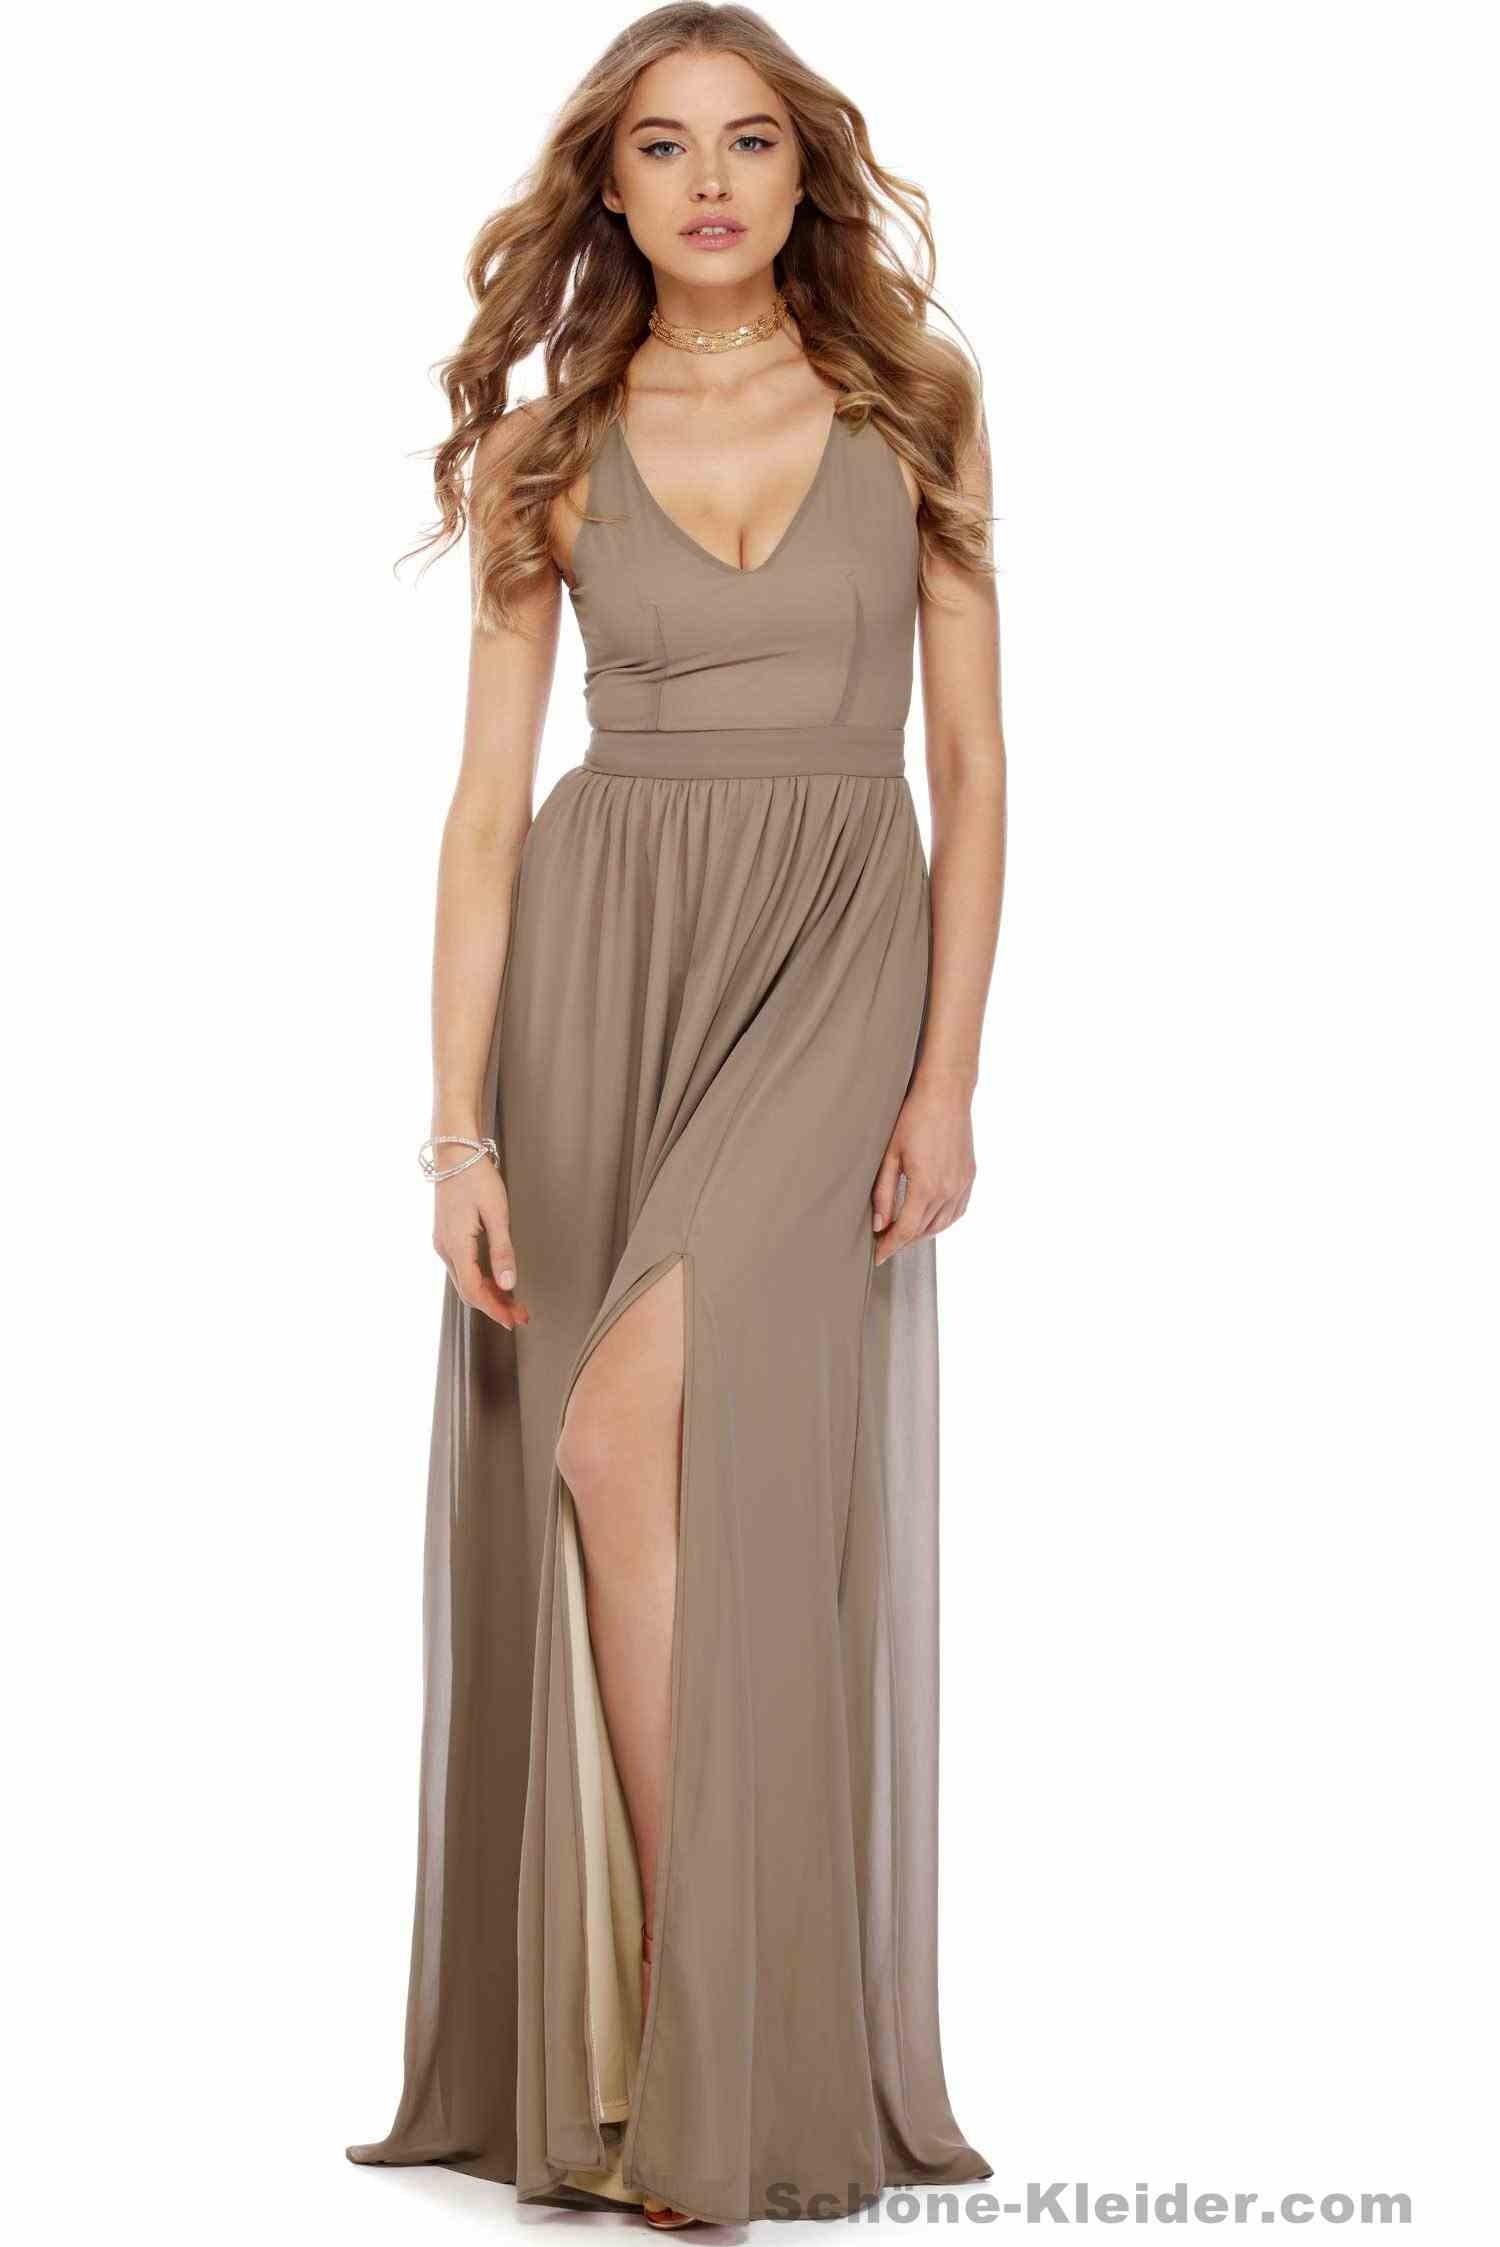 15 Cool Kleider Abendkleider Lang Boutique13 Fantastisch Kleider Abendkleider Lang für 2019